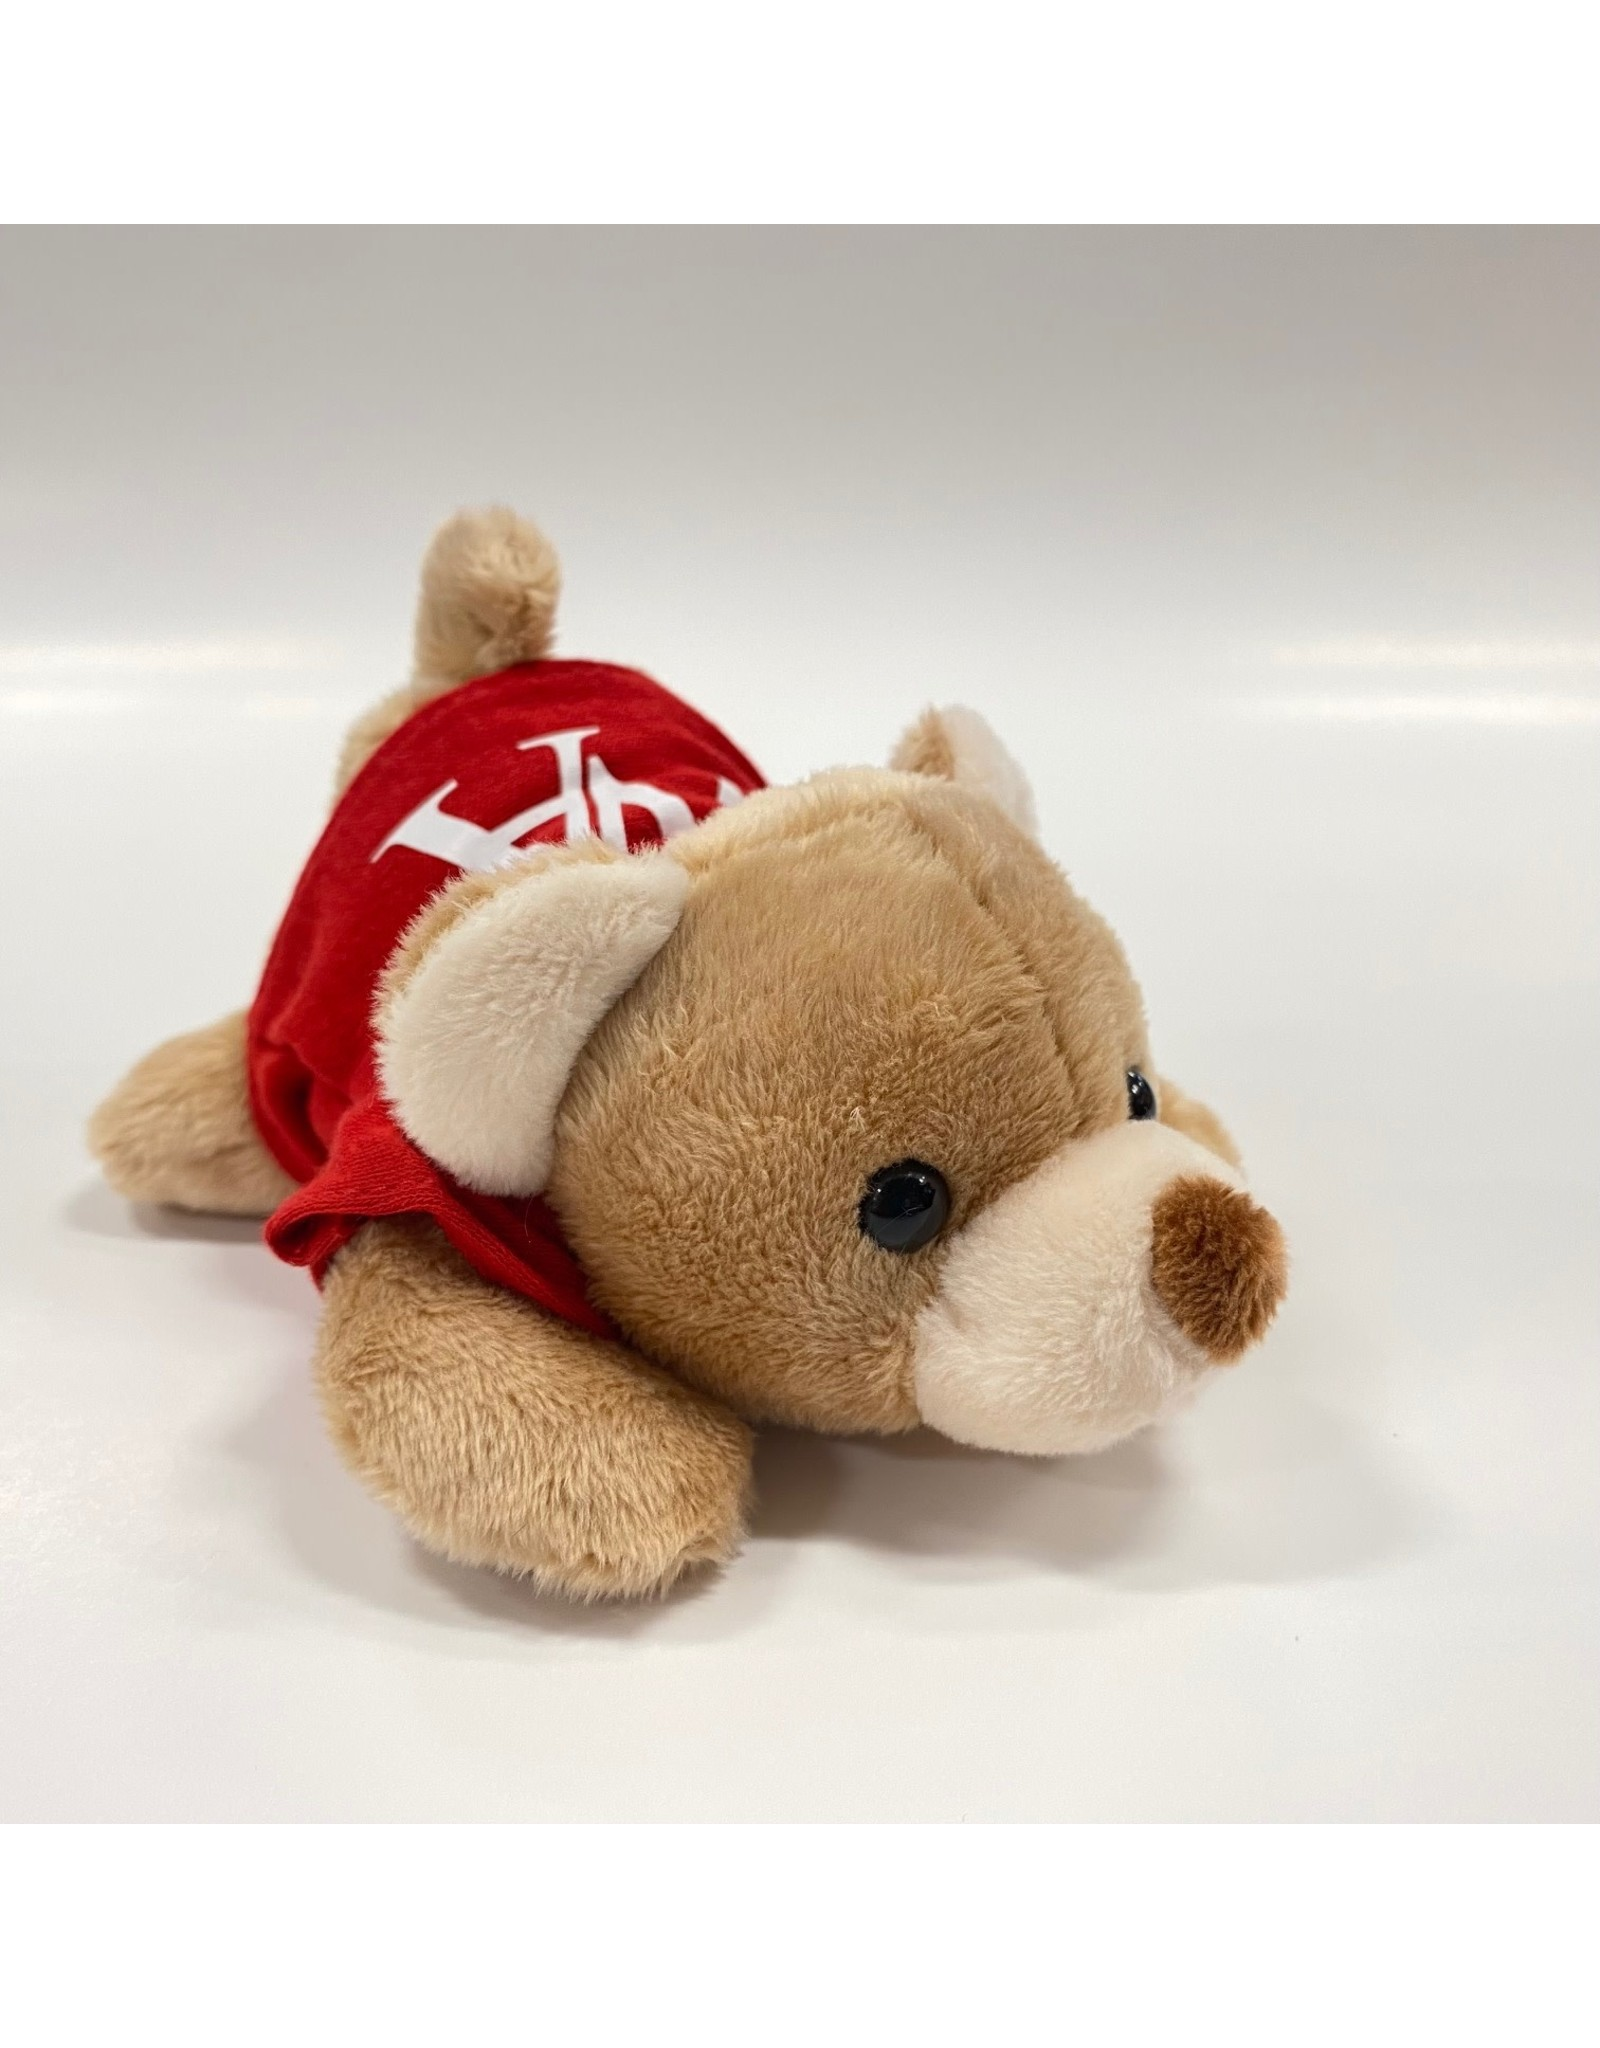 Mascot Factory Plush Chublet - Bear